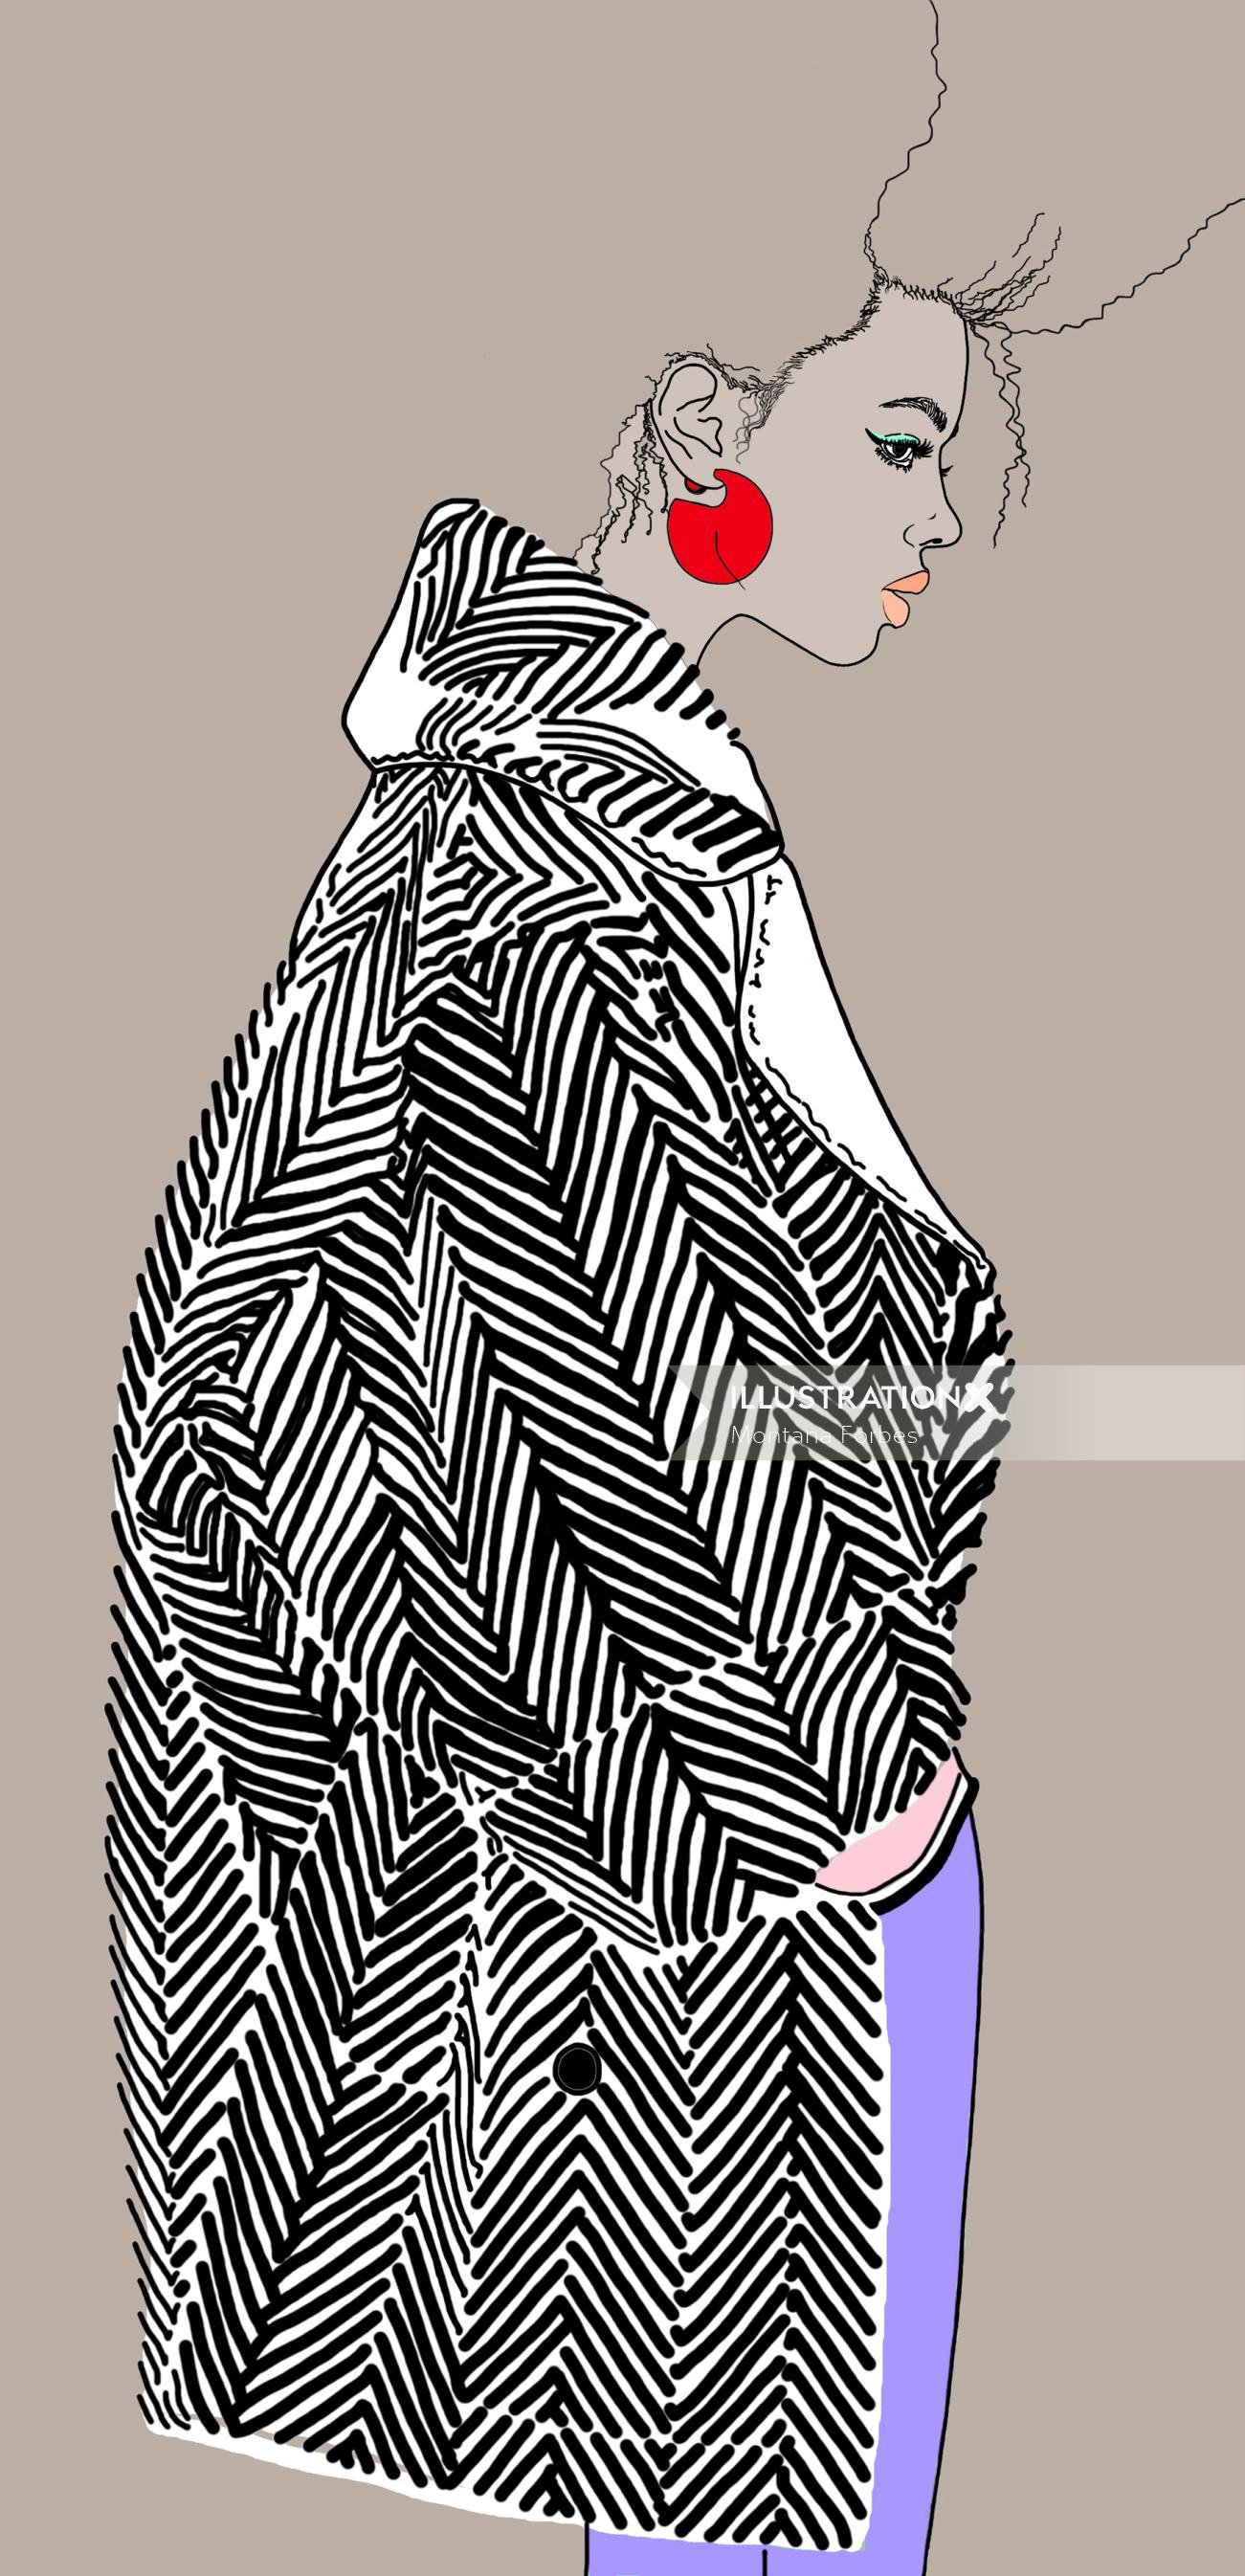 fashion model wearing black striped shirt